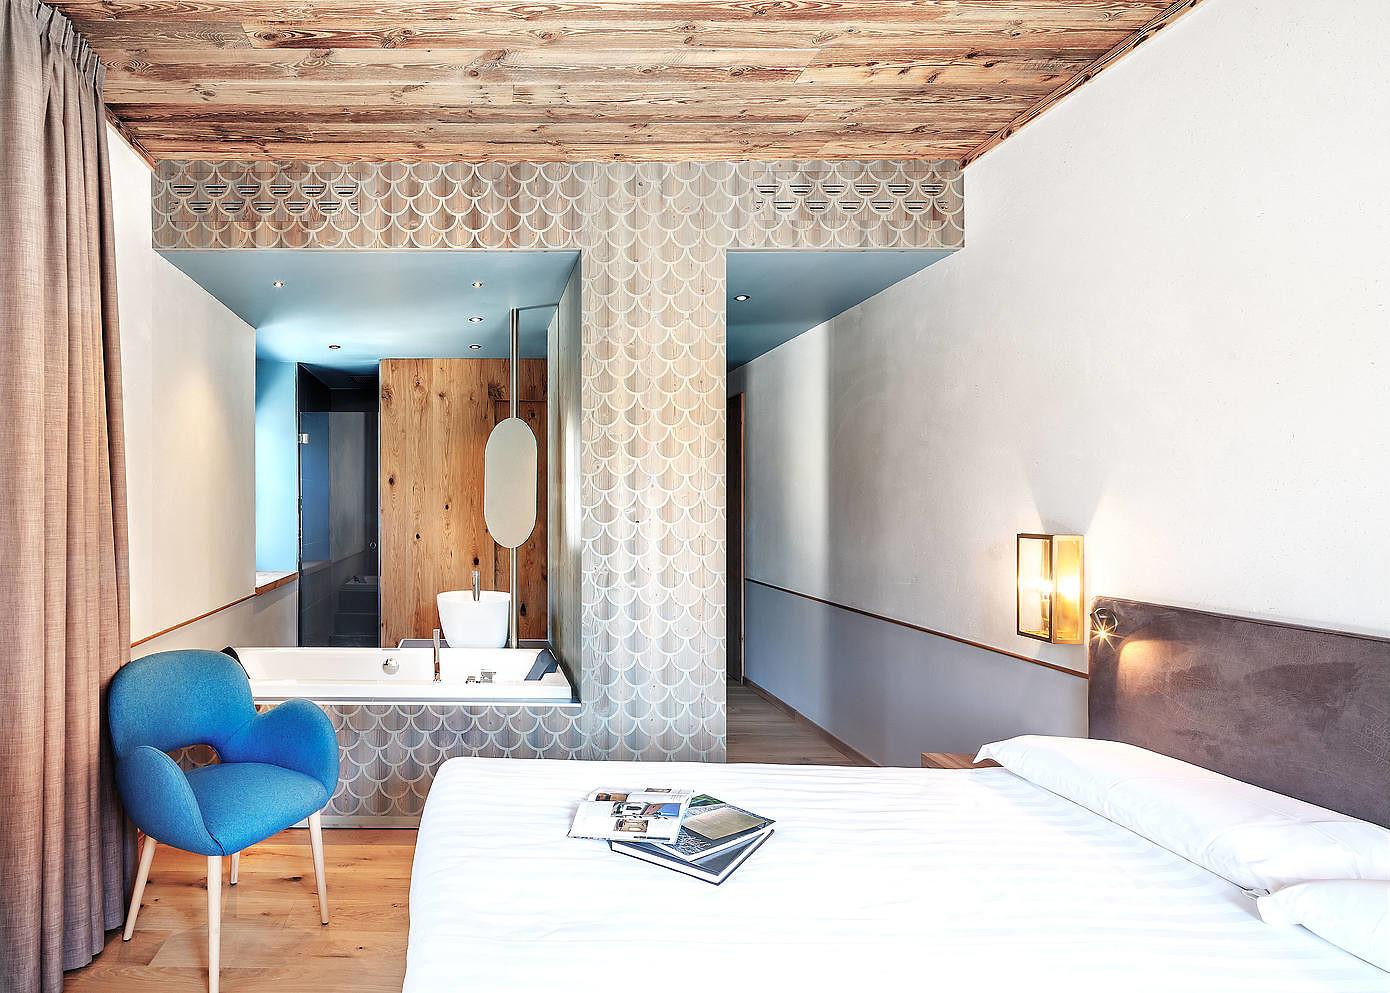 Hotel garden by studio raro homeadore for Shea homes design studio arizona